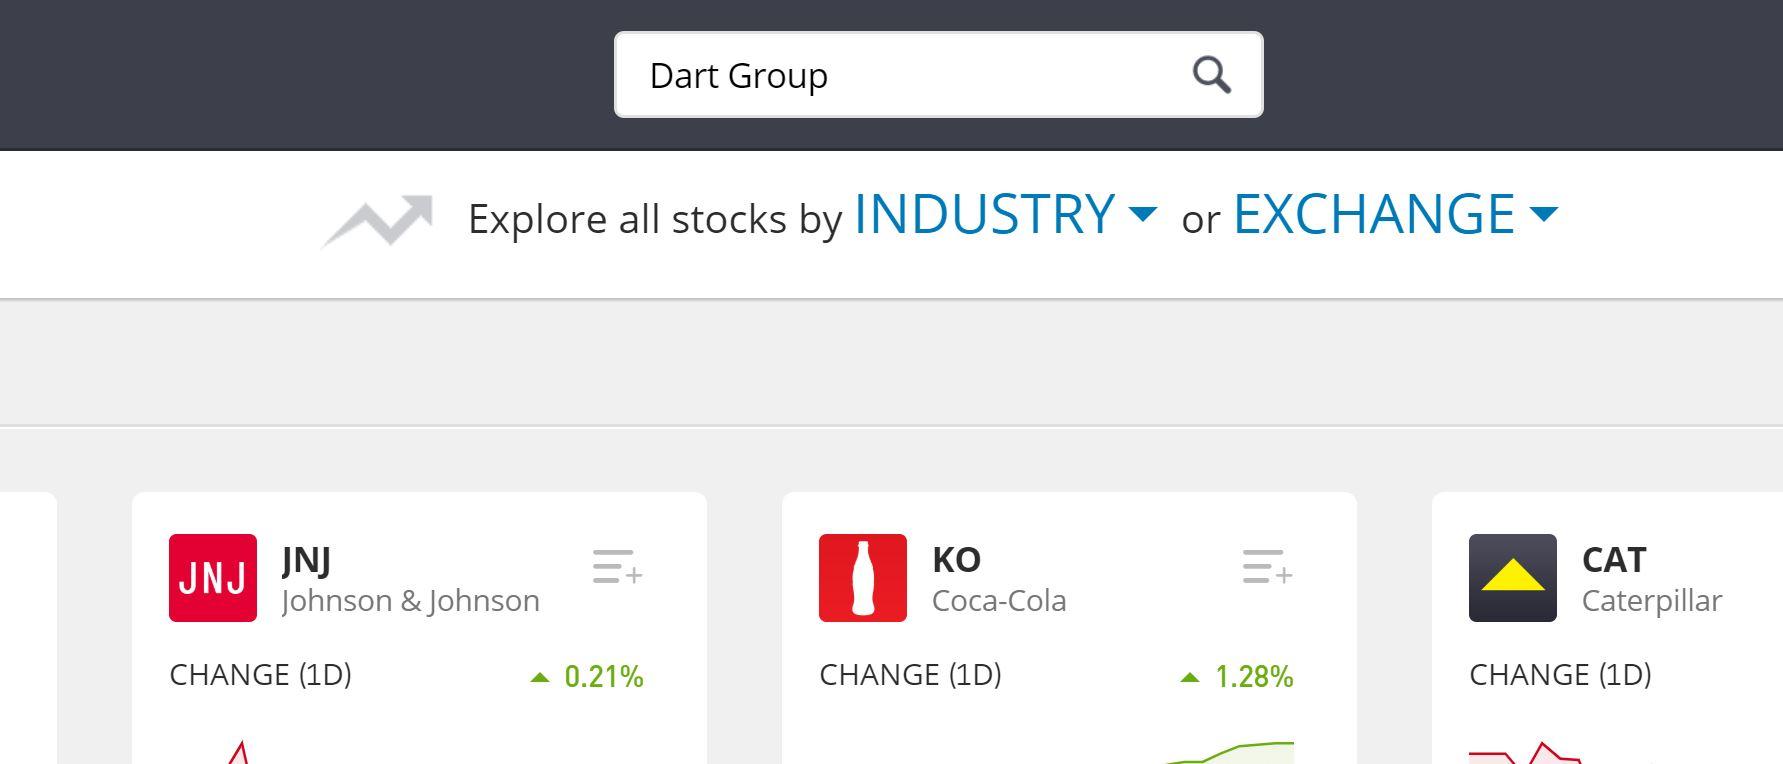 Search for Dart Group on eToro